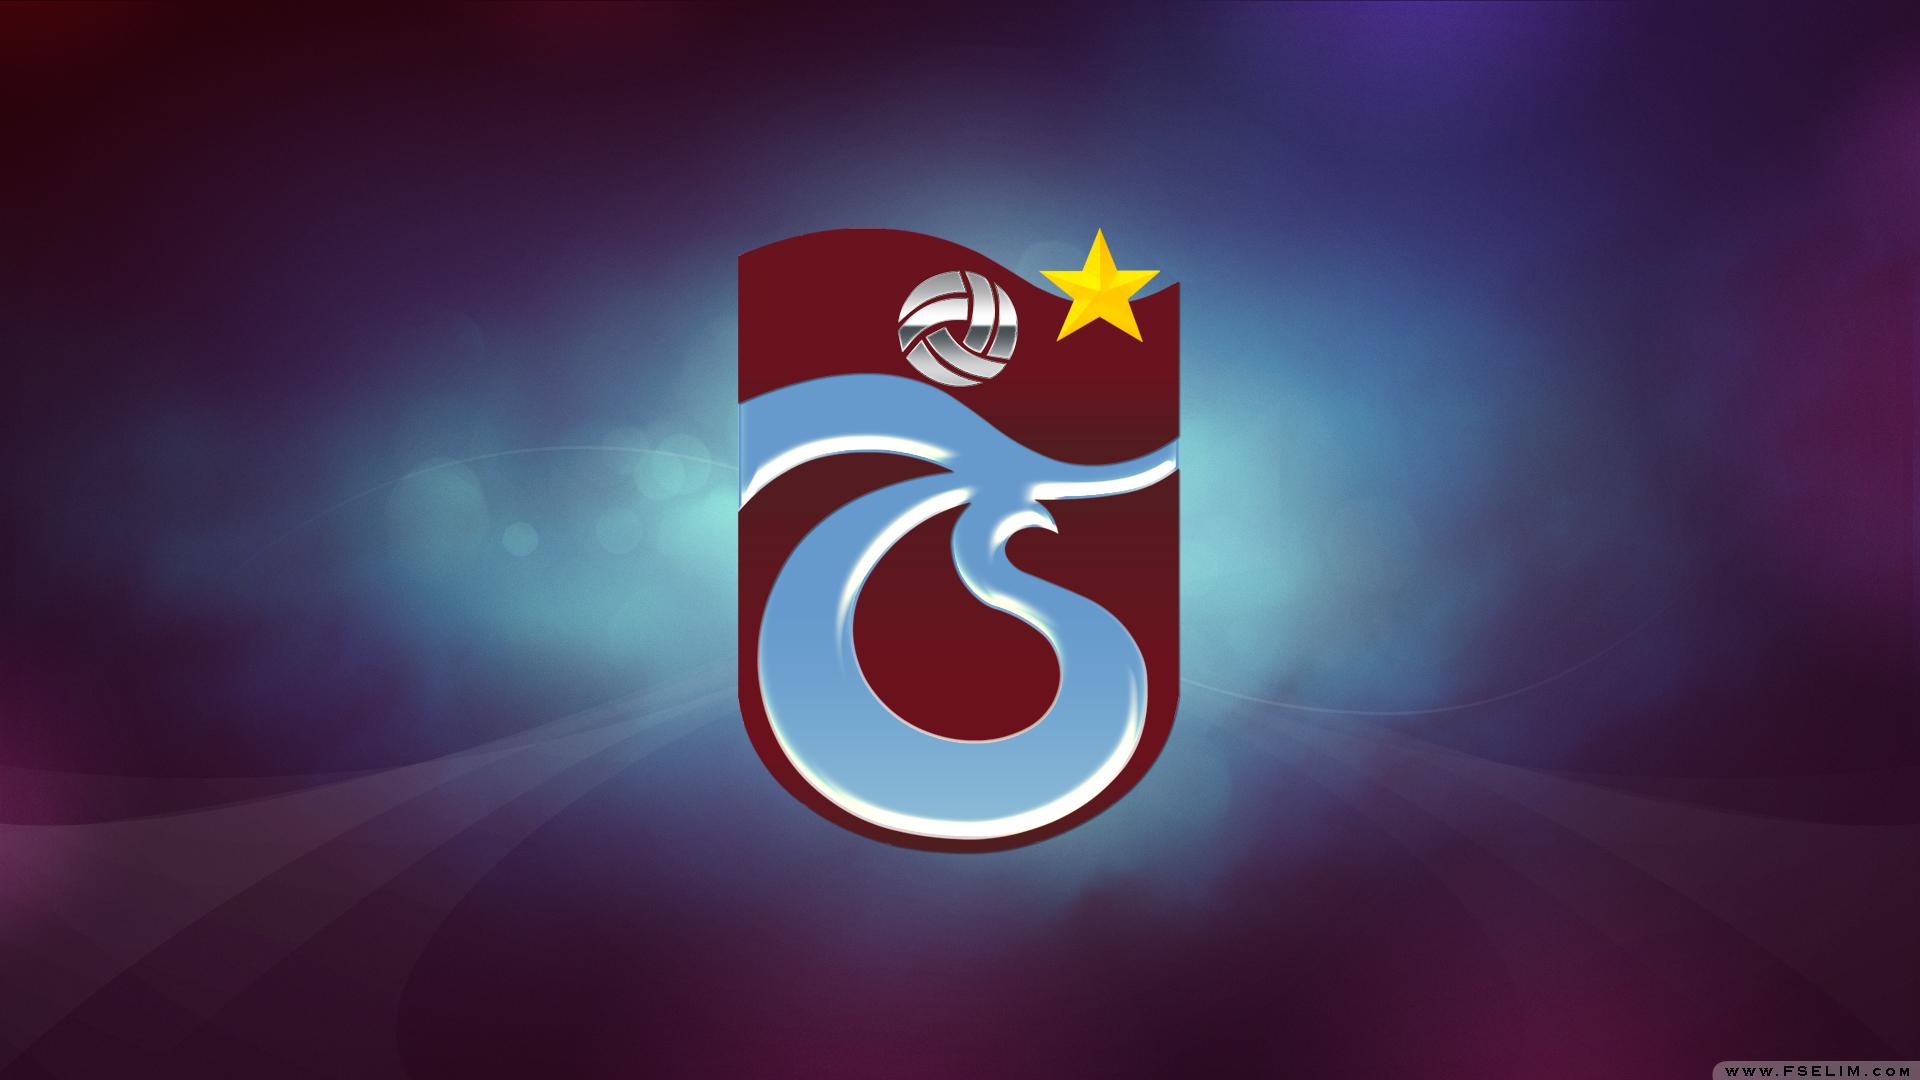 Trabzonspor Wallpaper By TrabzonFan On DeviantArt